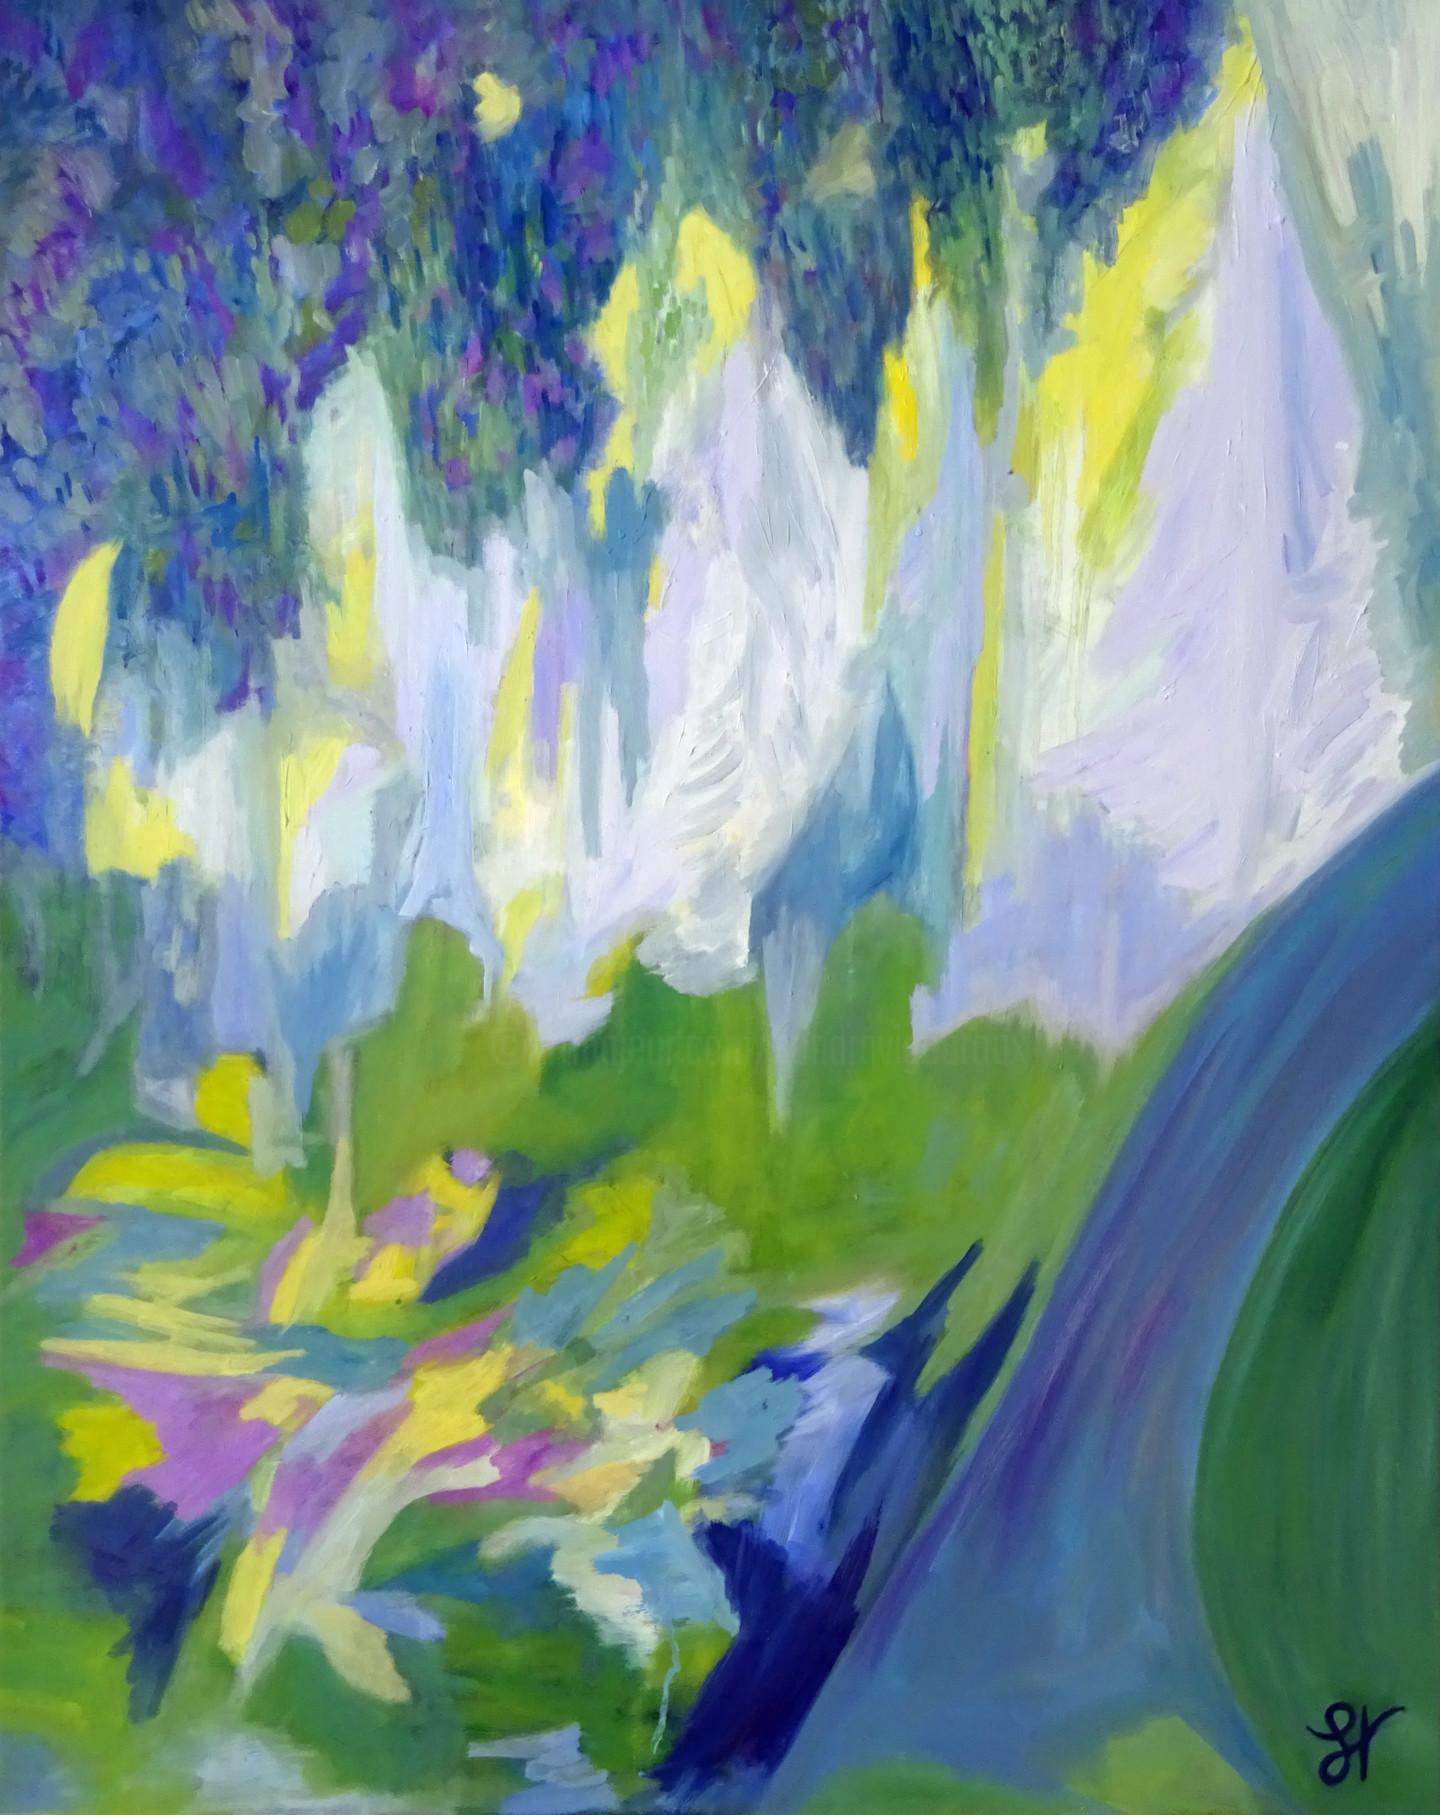 Sandra Vigouroux - La forêt bleue du jardin Albert Kahn